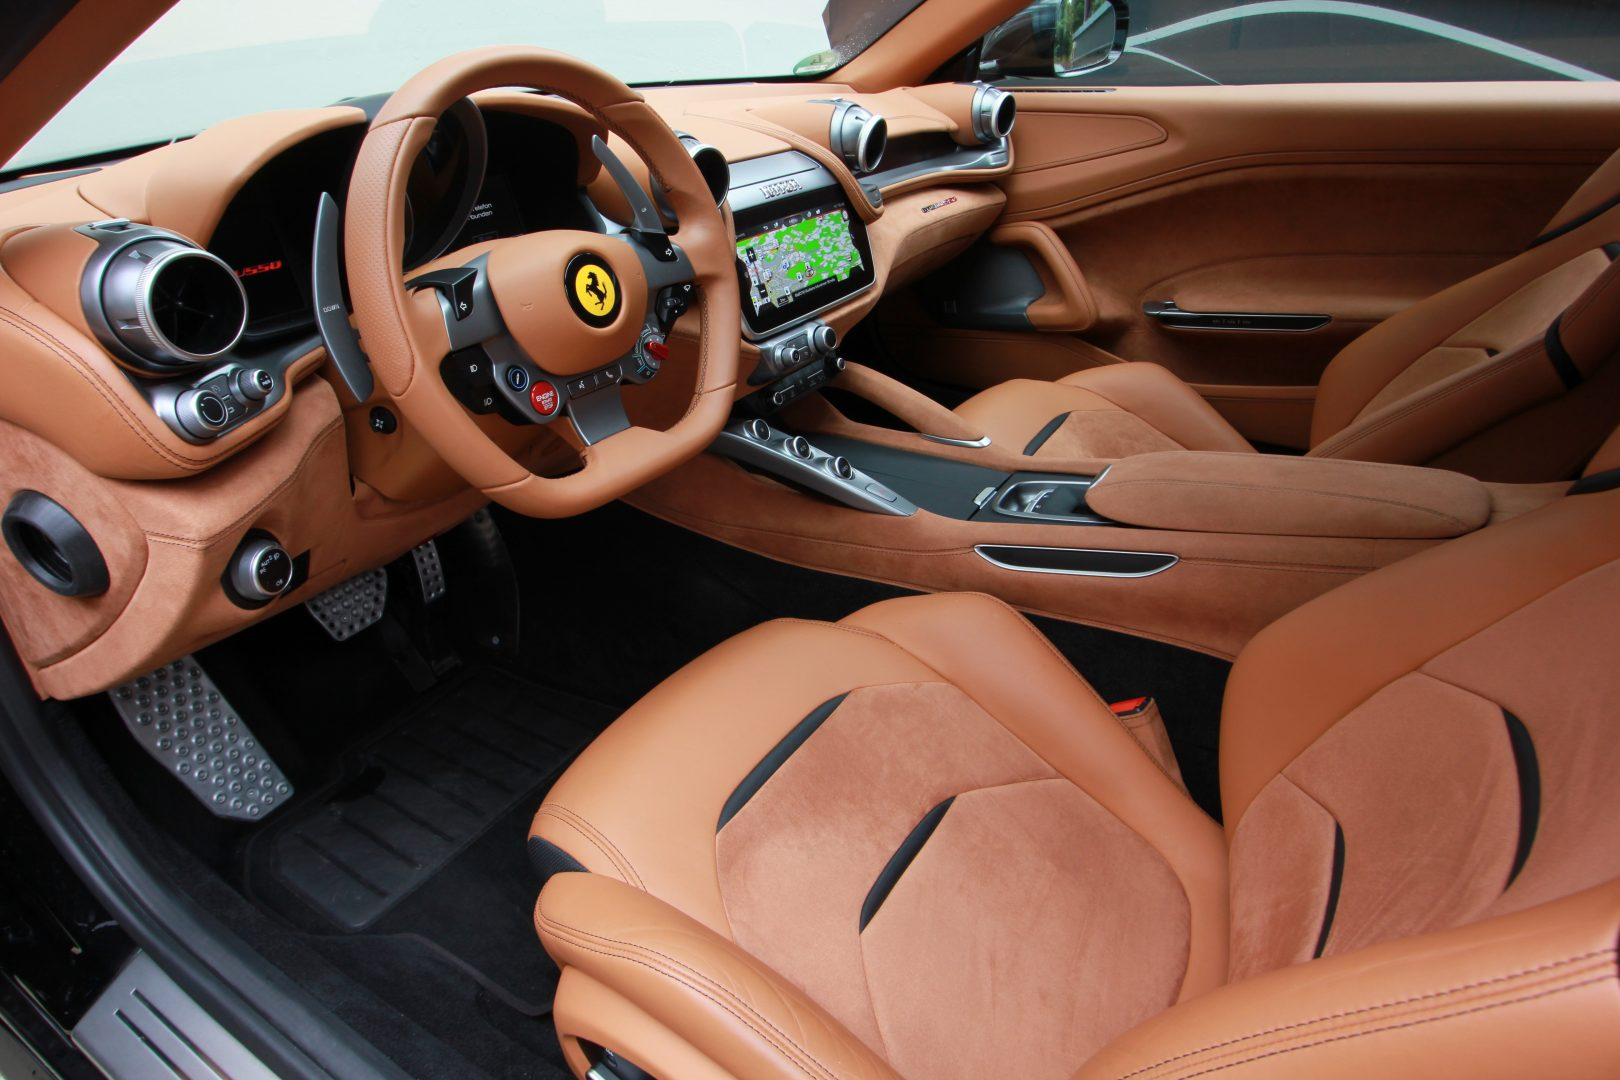 AIL Ferrari GTC4Lusso 2